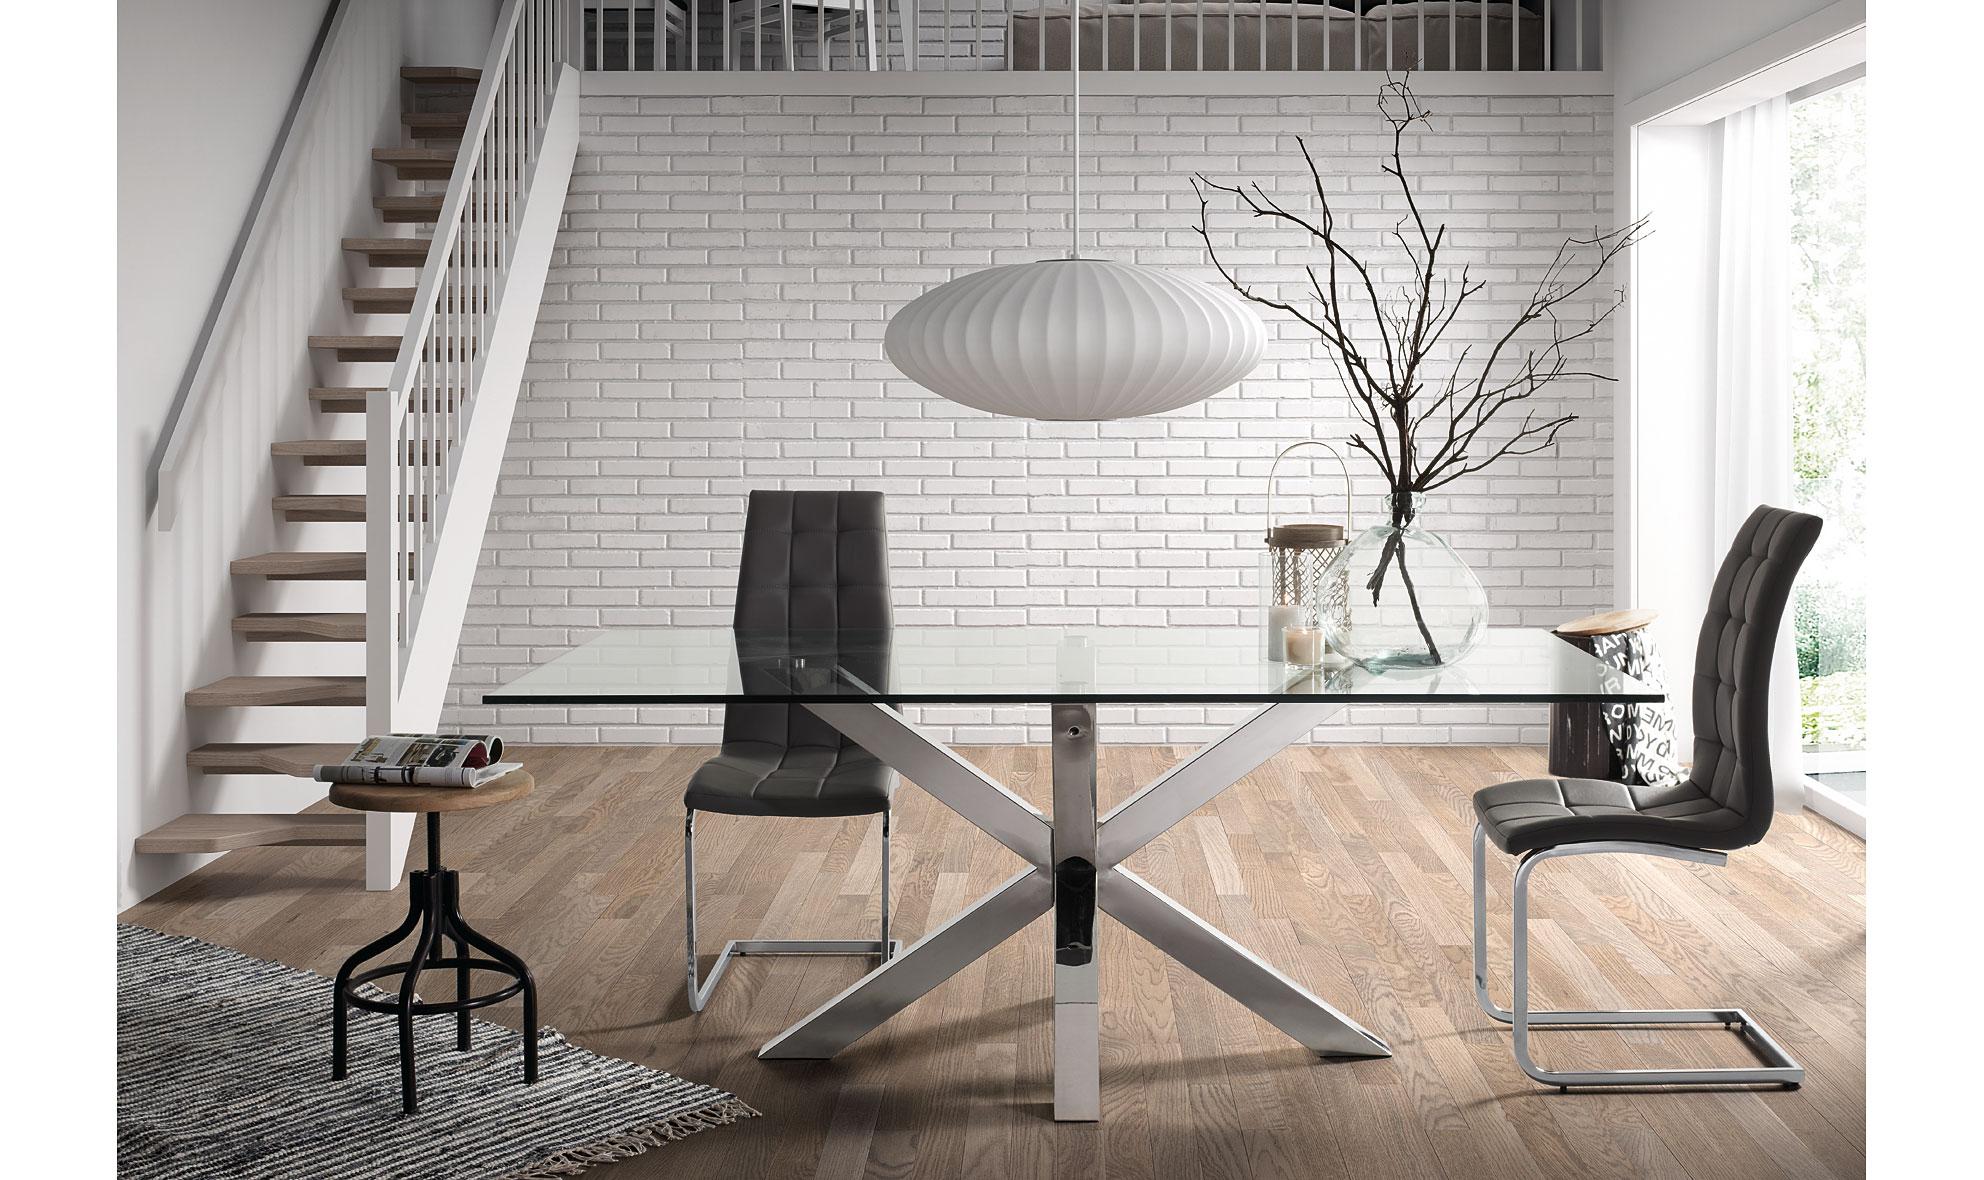 Mesa de comedor cuadrada moderna arya en for Mesas de comedor cuadradas modernas